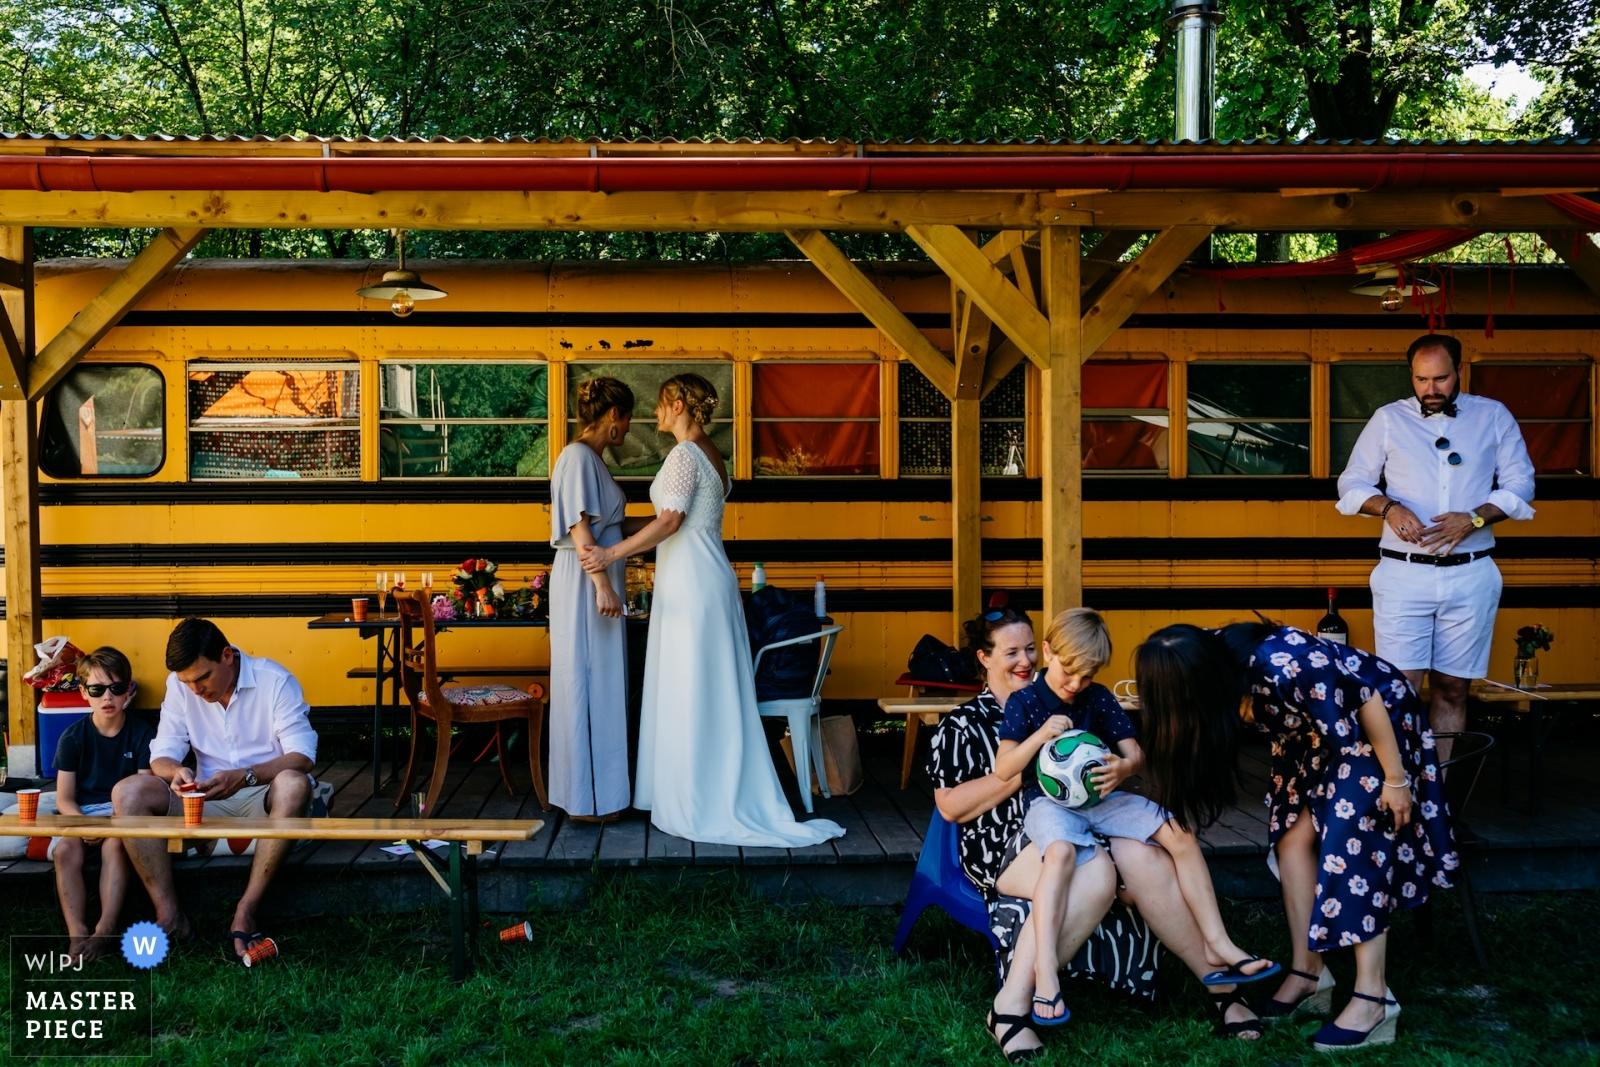 Wedding photo journalists association v7 2019